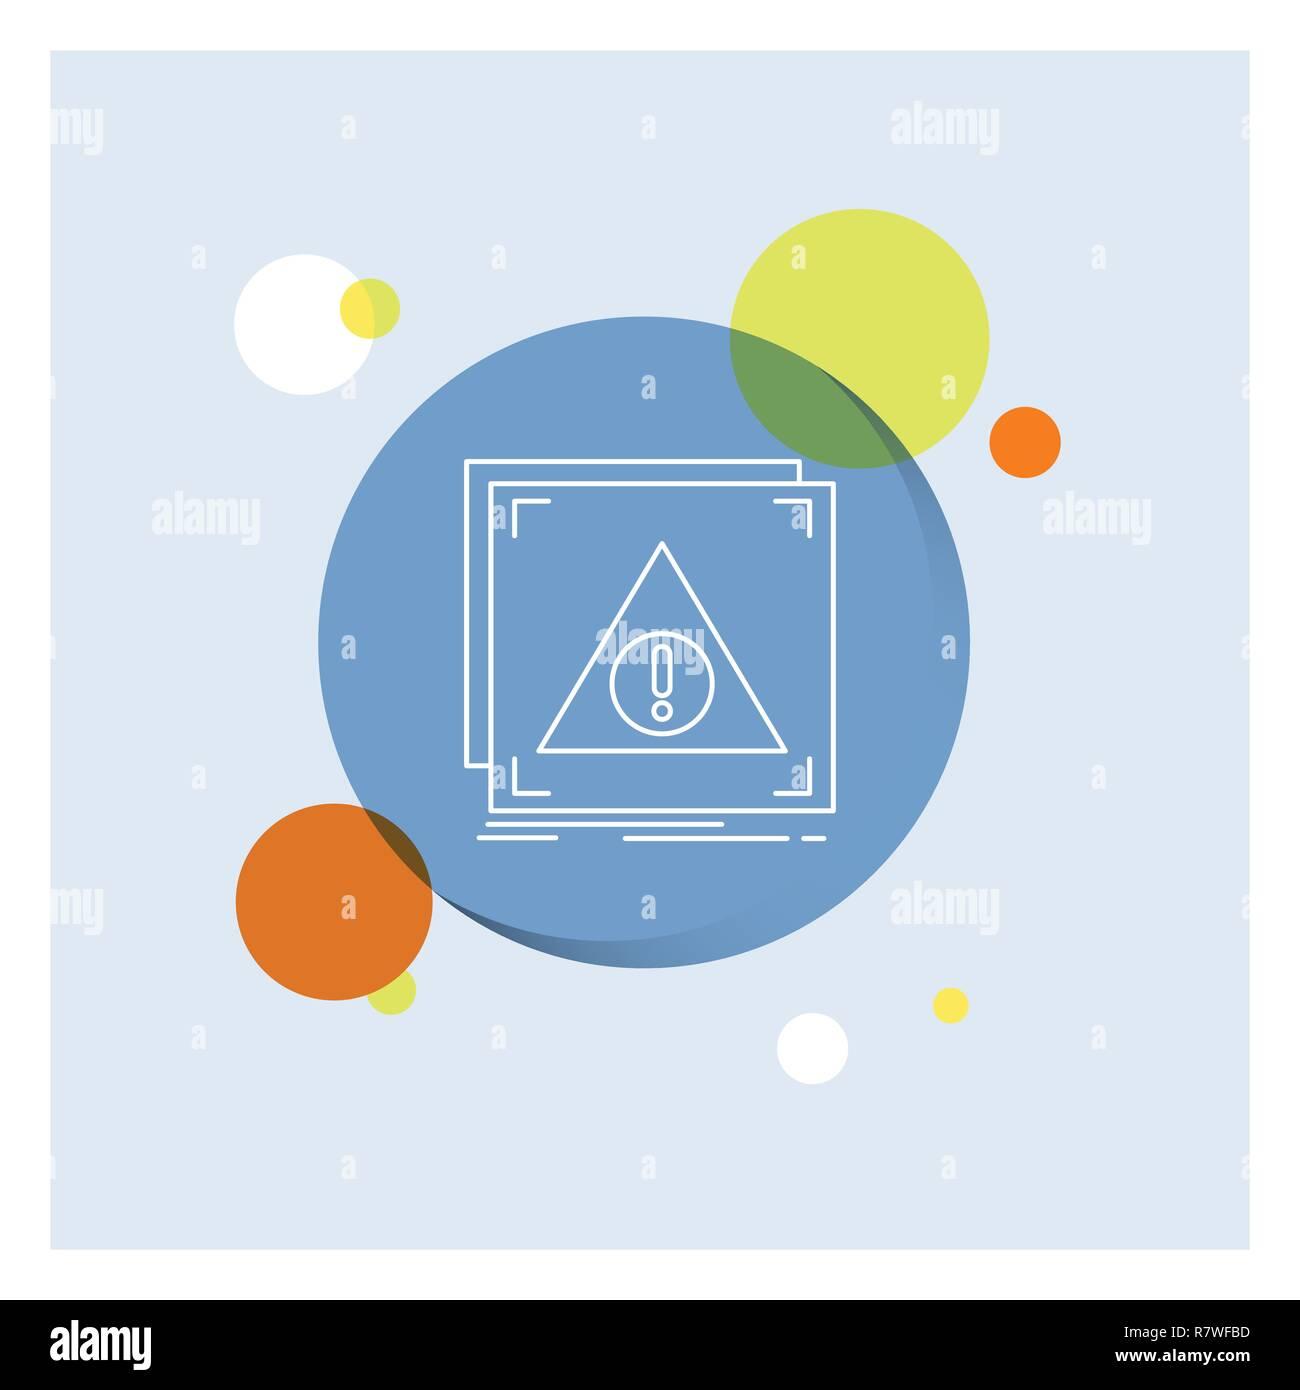 Error, Application, Denied, server, alert White Line Icon colorful Circle Background - Stock Image